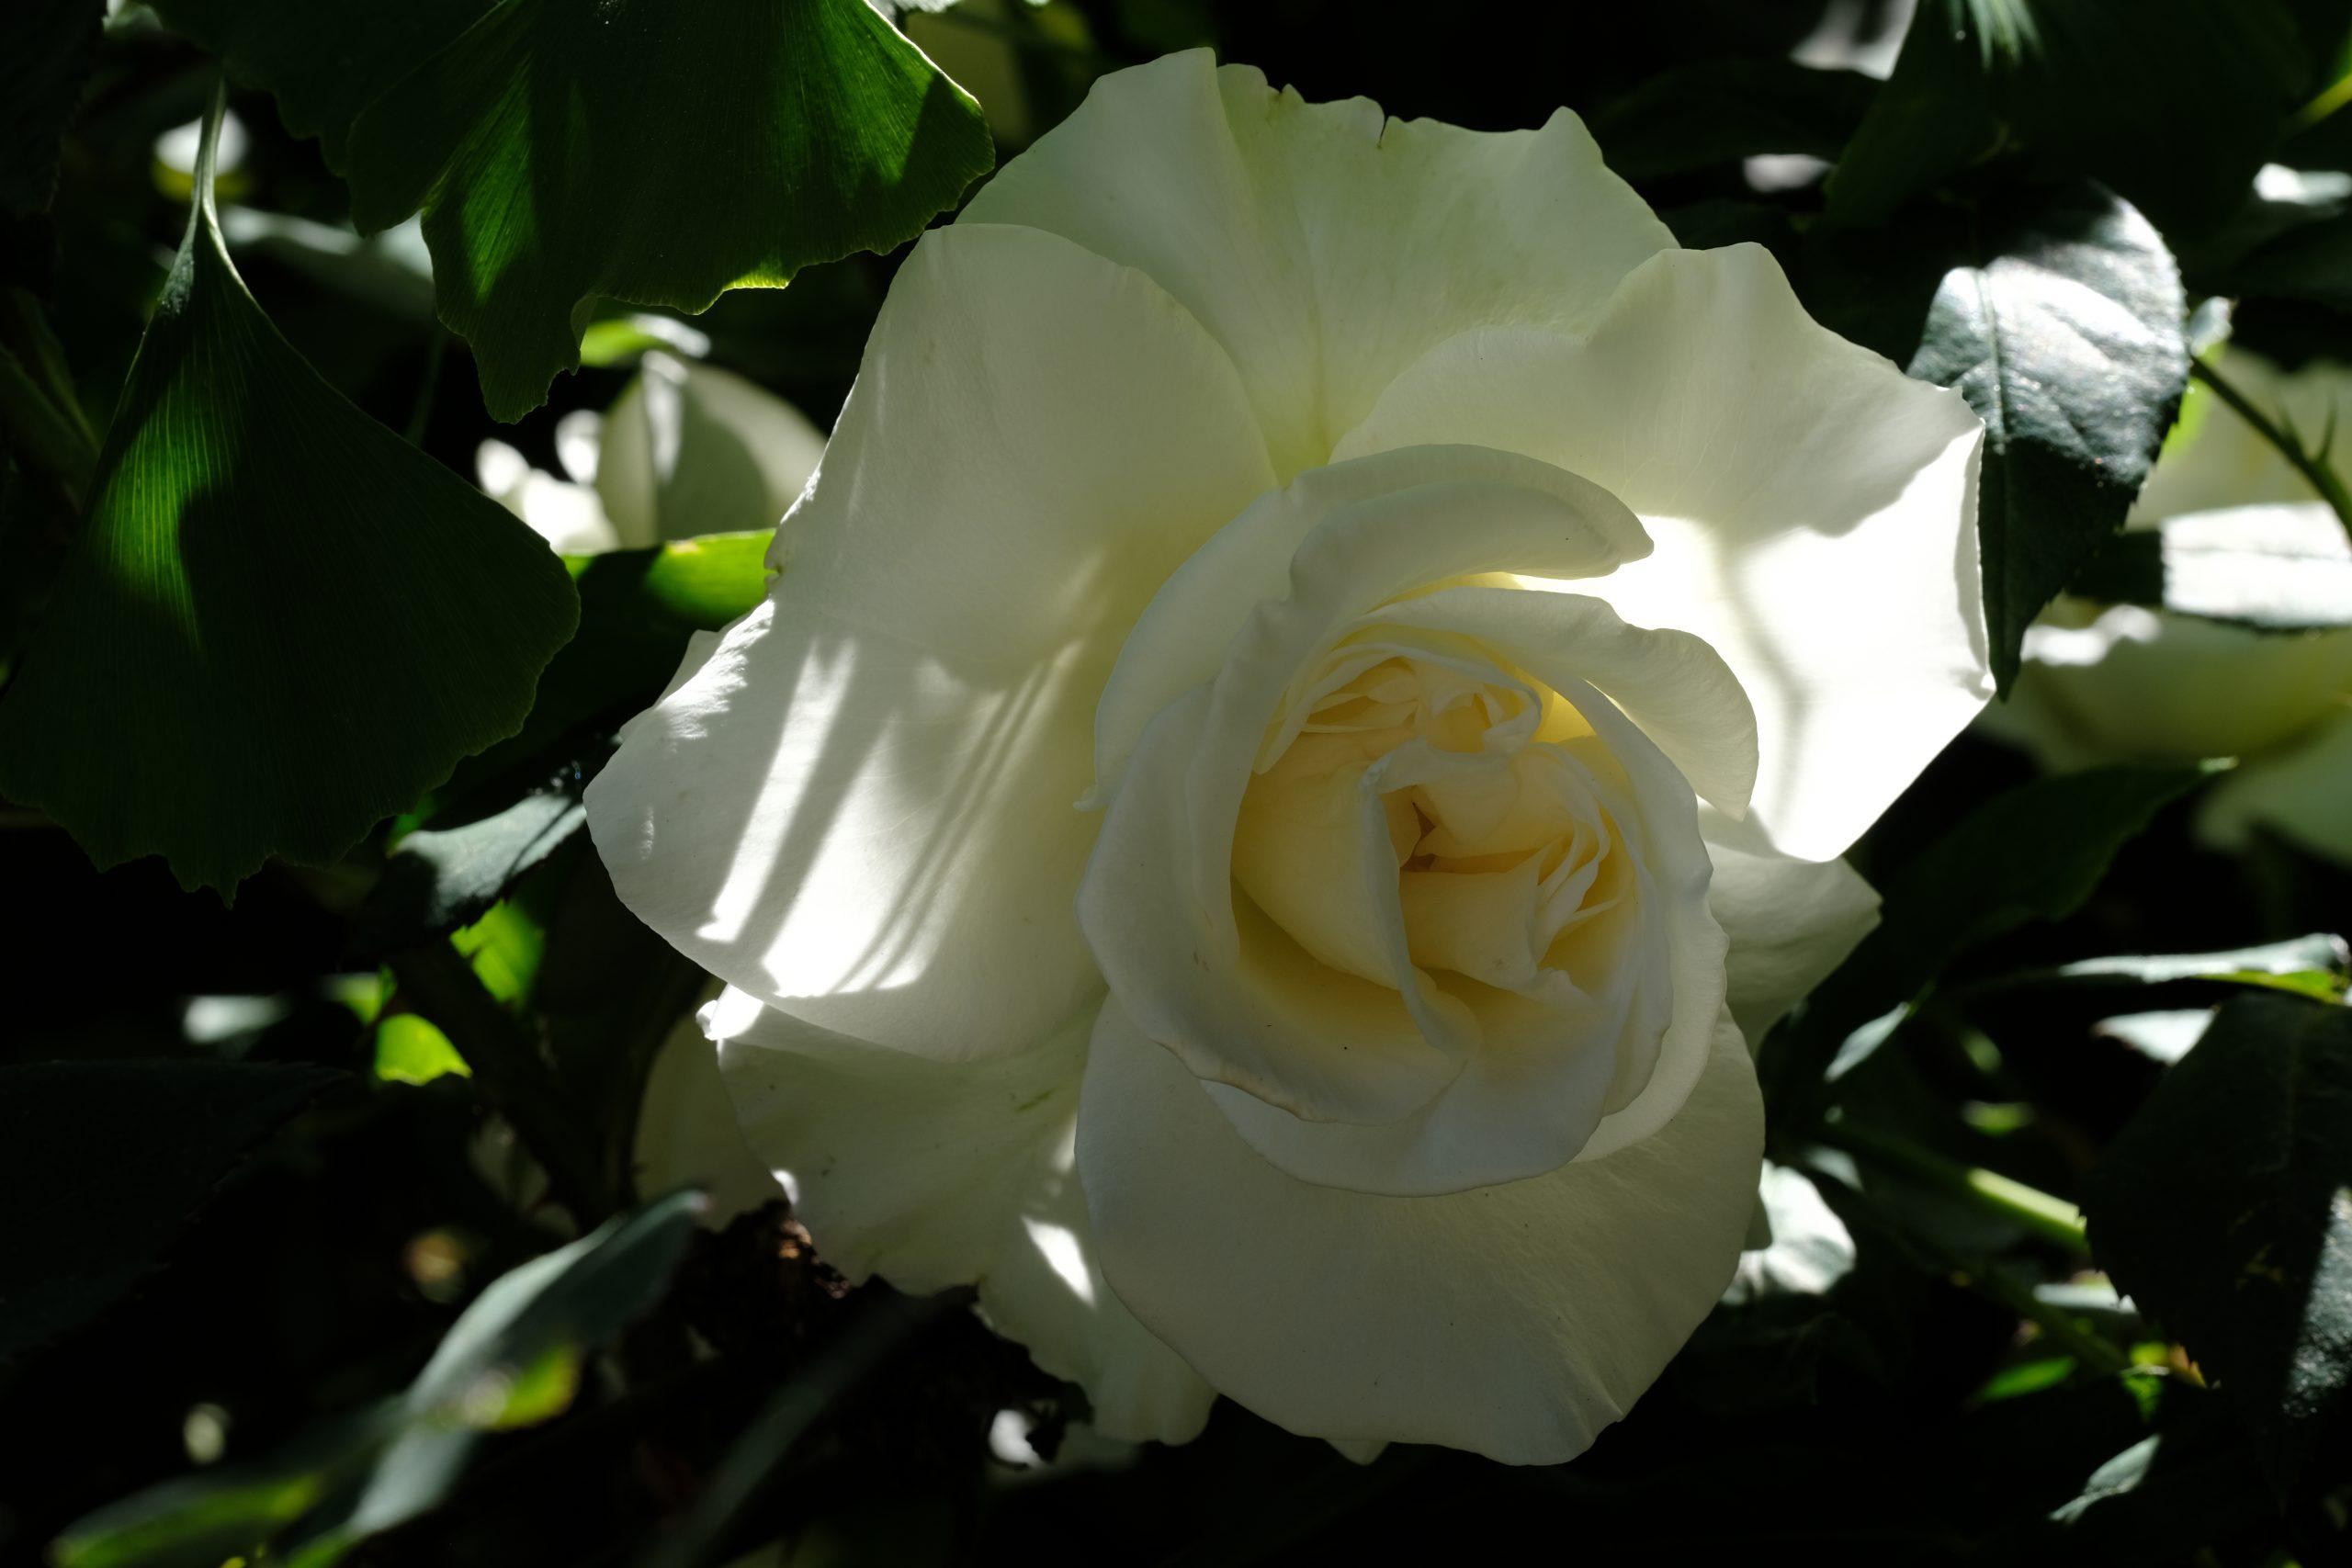 White Rose Oregon 16 May 2021 Copyright Steve J Davis